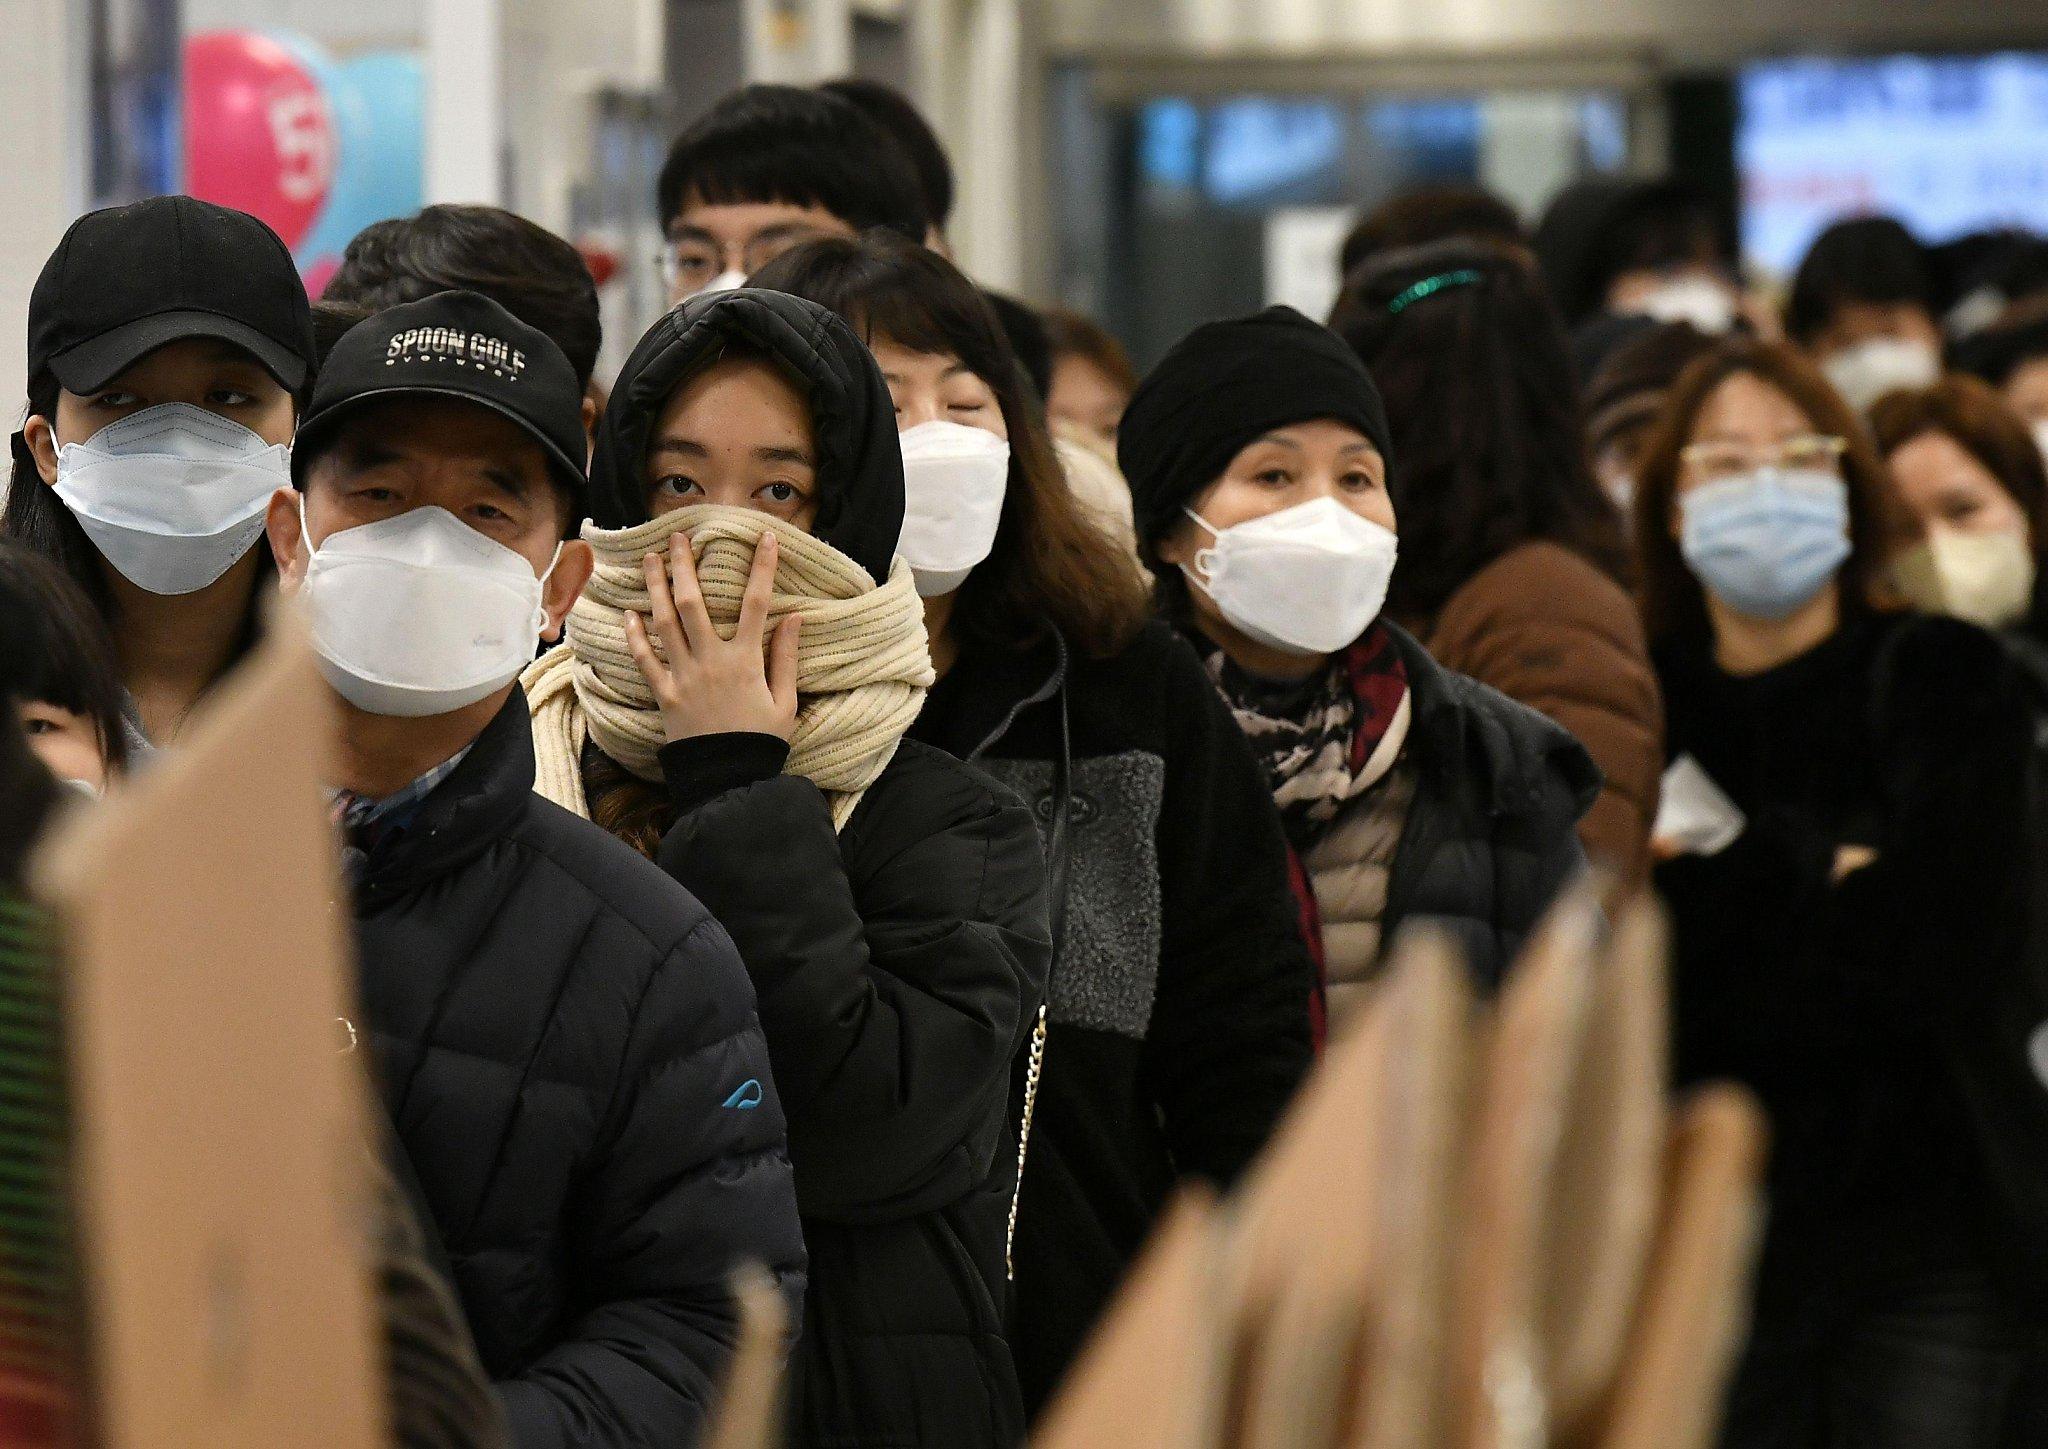 Coronavirus live updates: CDC tells Americans to prepare for spread